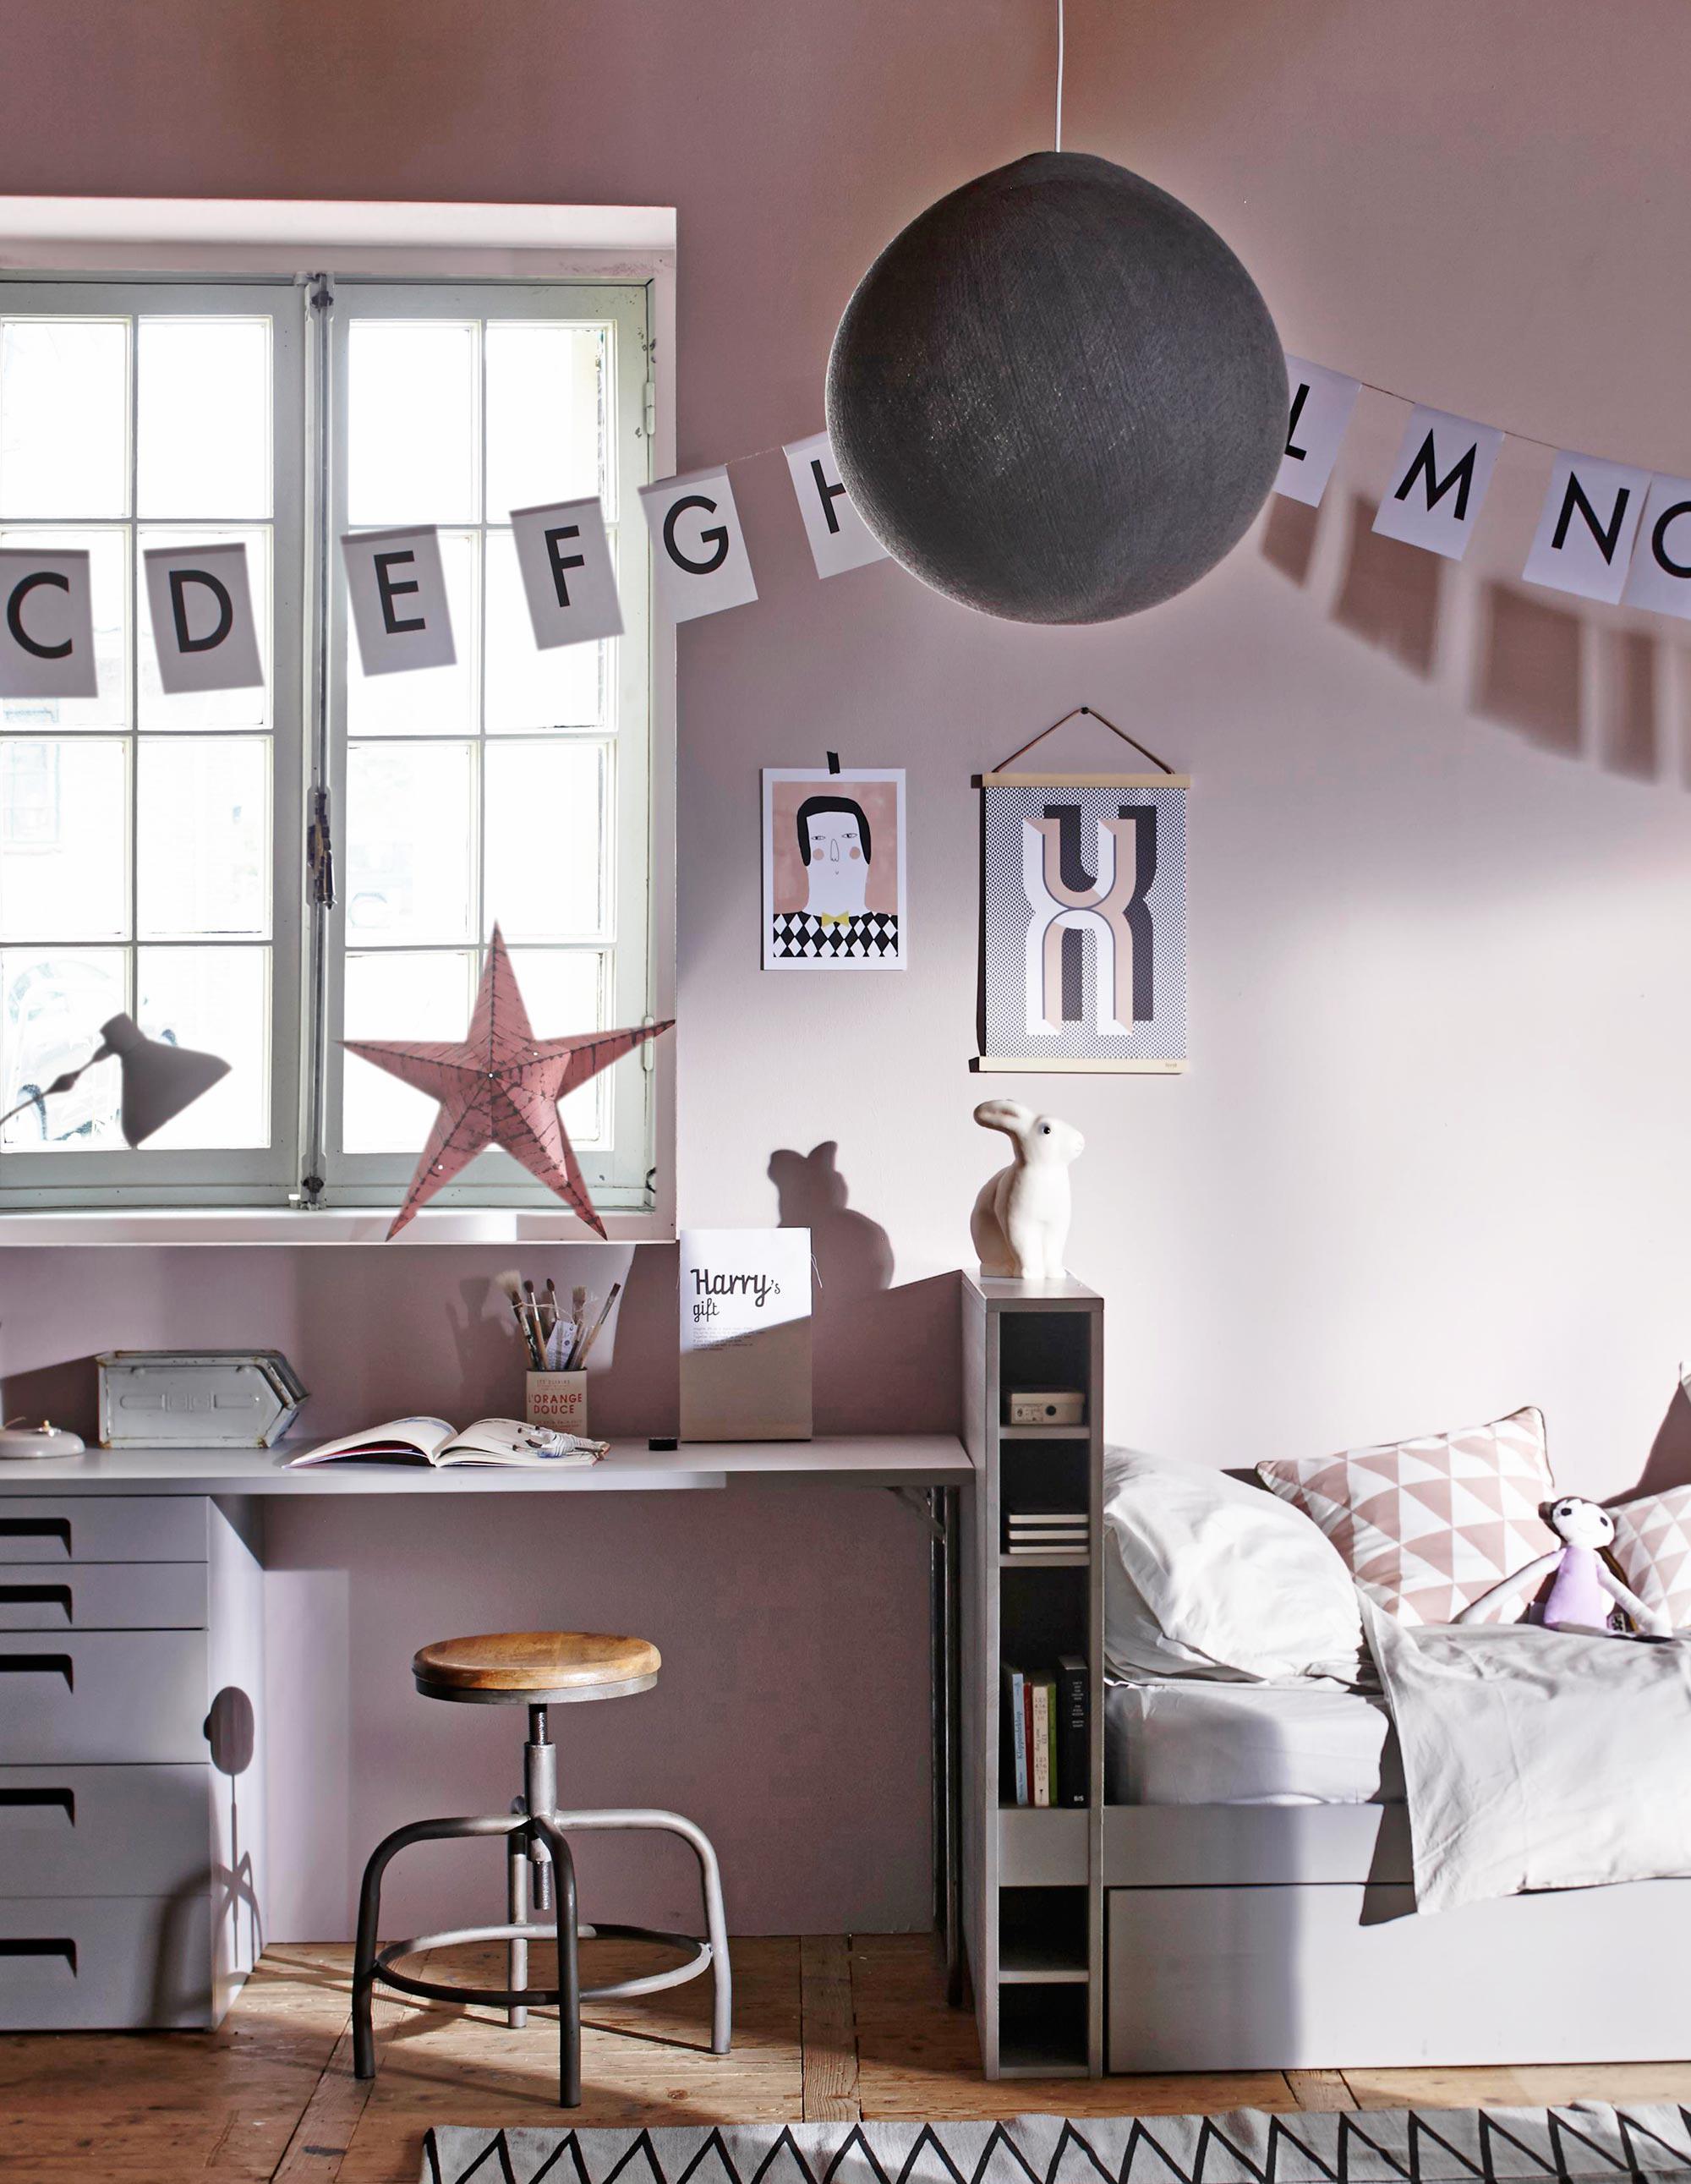 kidsroom, roze-kinderkamer, kinderkamer idee, kinderkamer inrichting, meisjeskamers